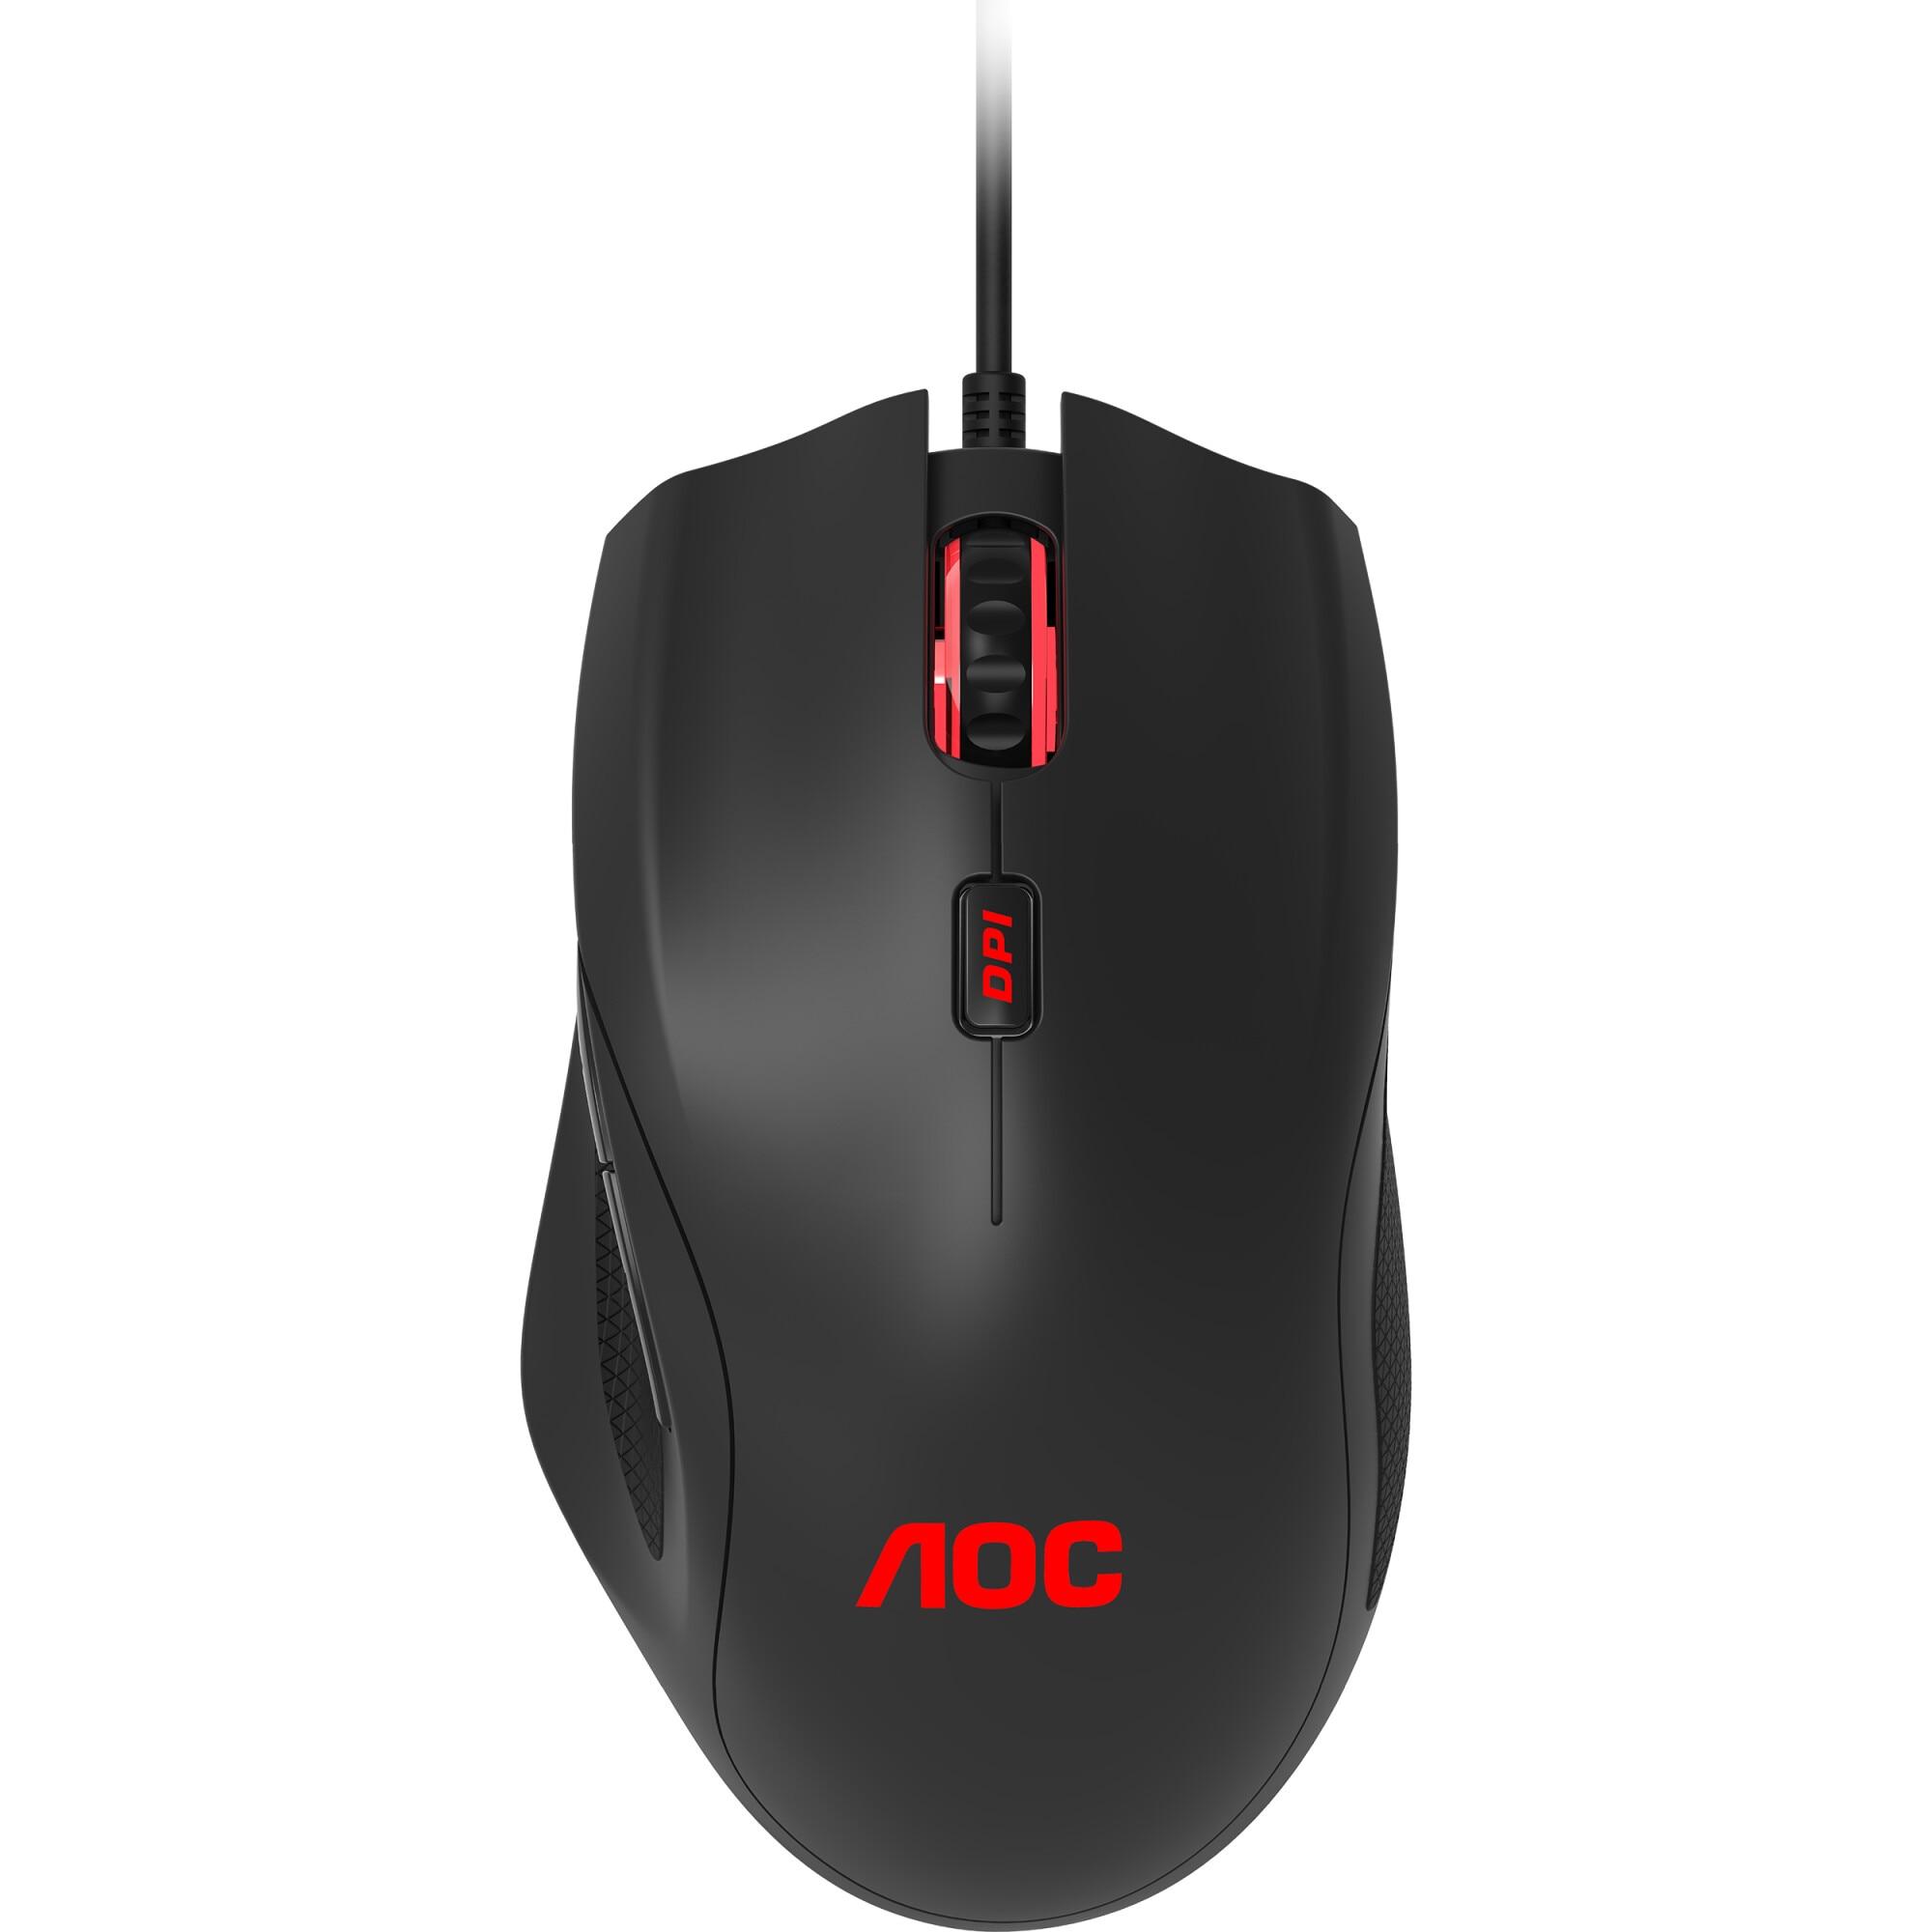 Fotografie Mouse gaming AOC GM200, iluminare RGB, ergonomic dreptaci, Negru